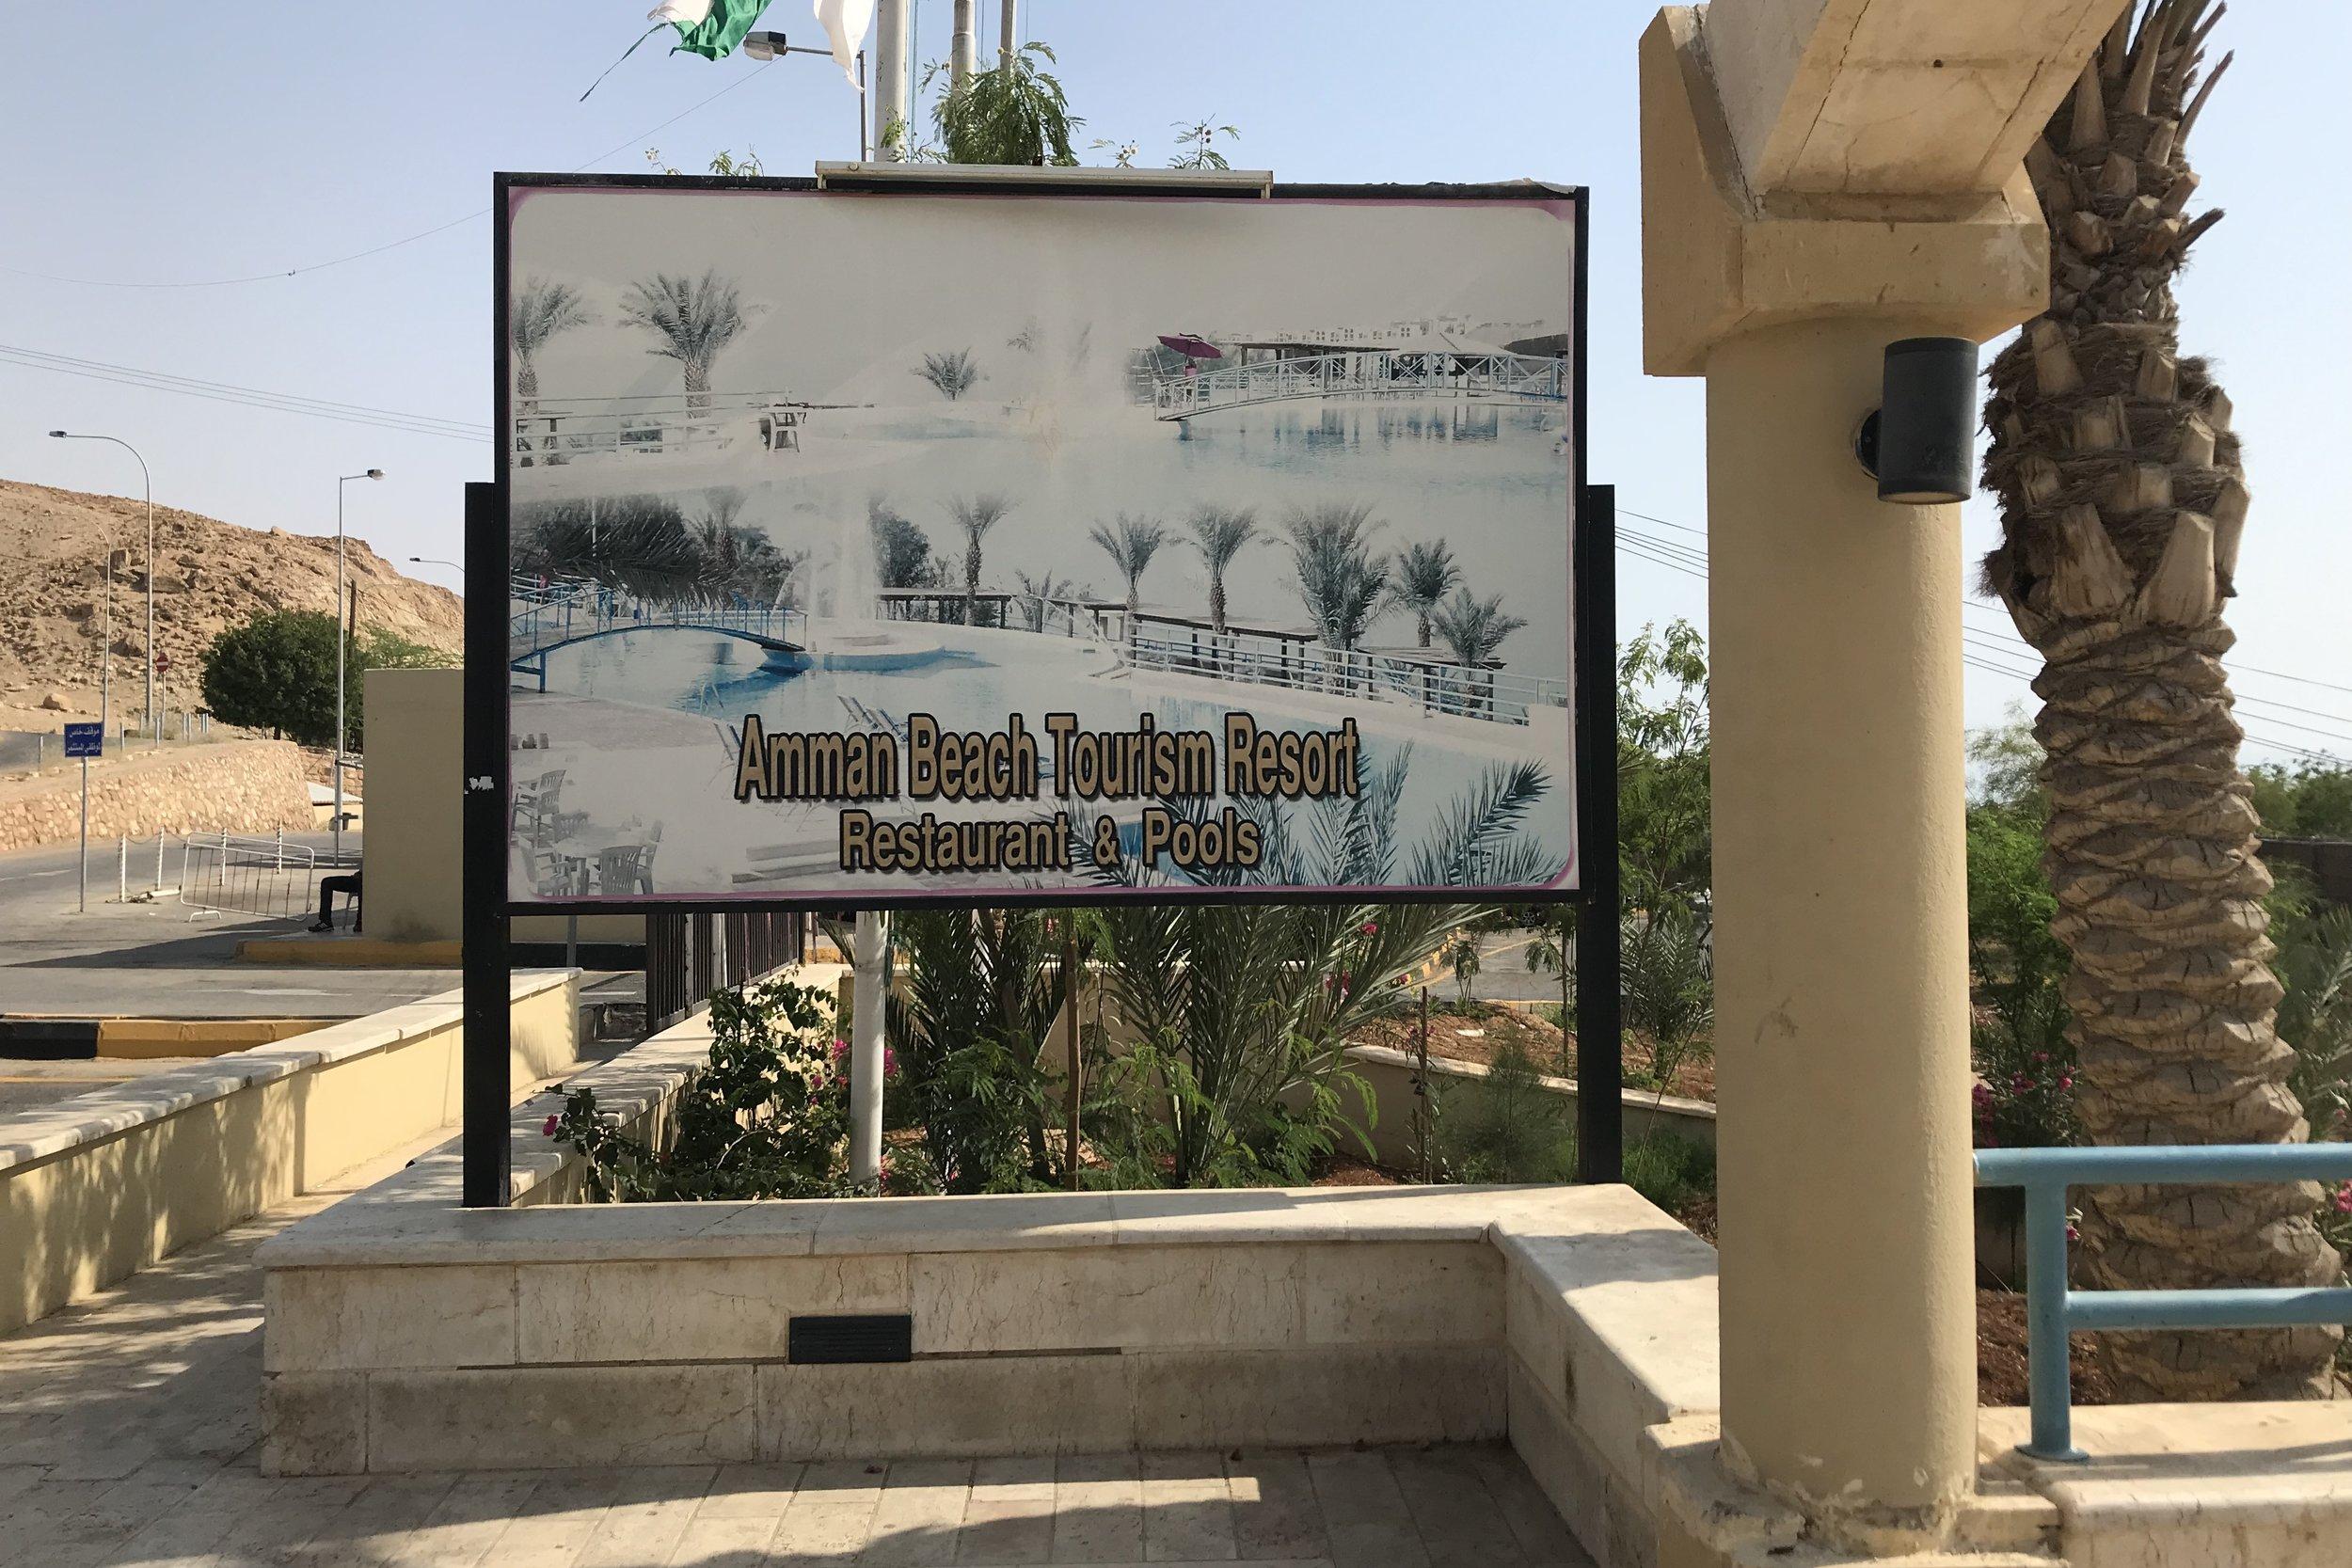 Dead Sea – Amman Beach facility